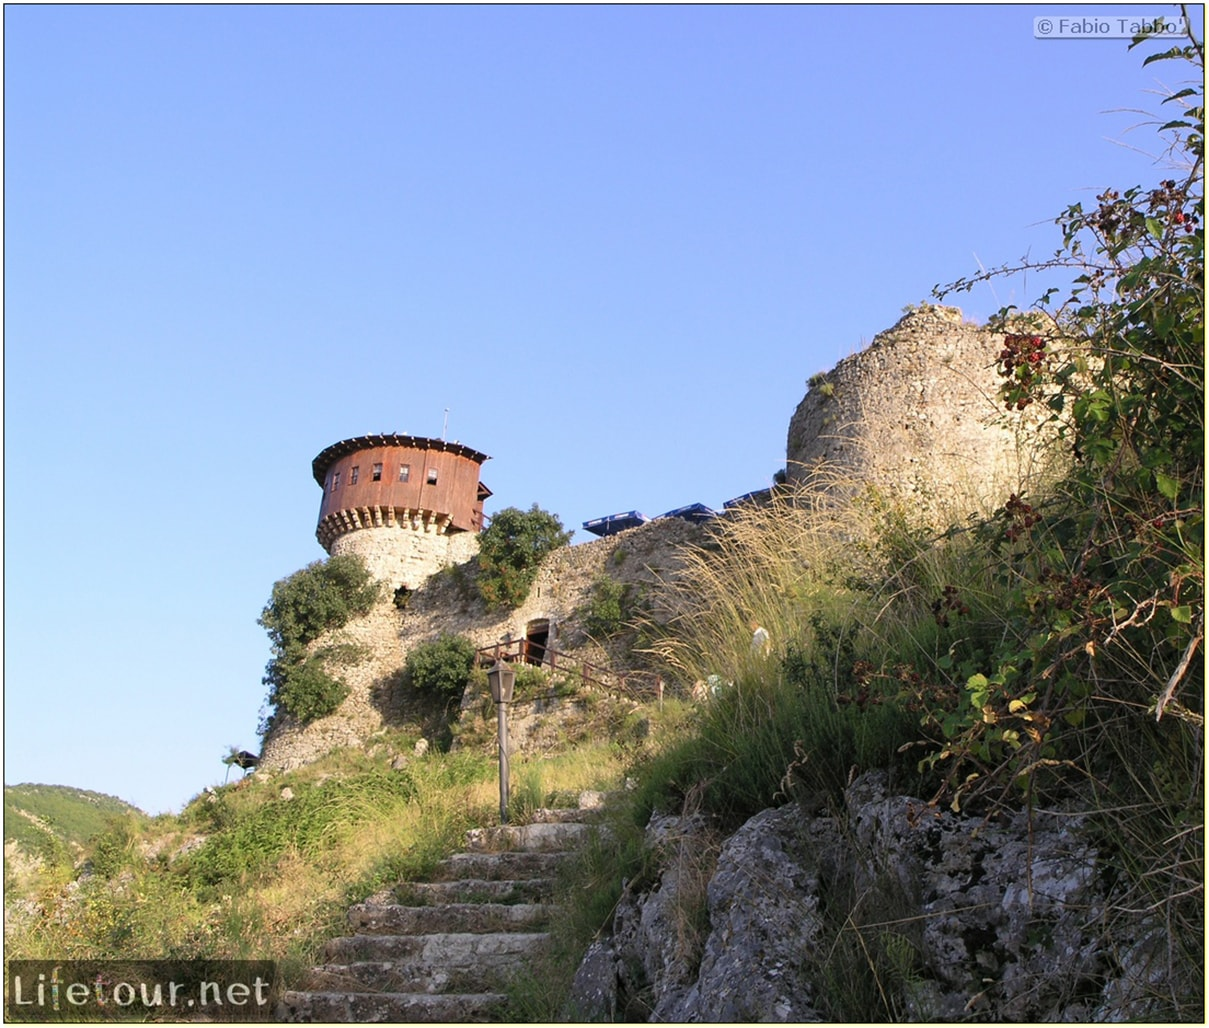 Fabios-LifeTour-Albania-2005-August-Petrelle-20102-COVER-2